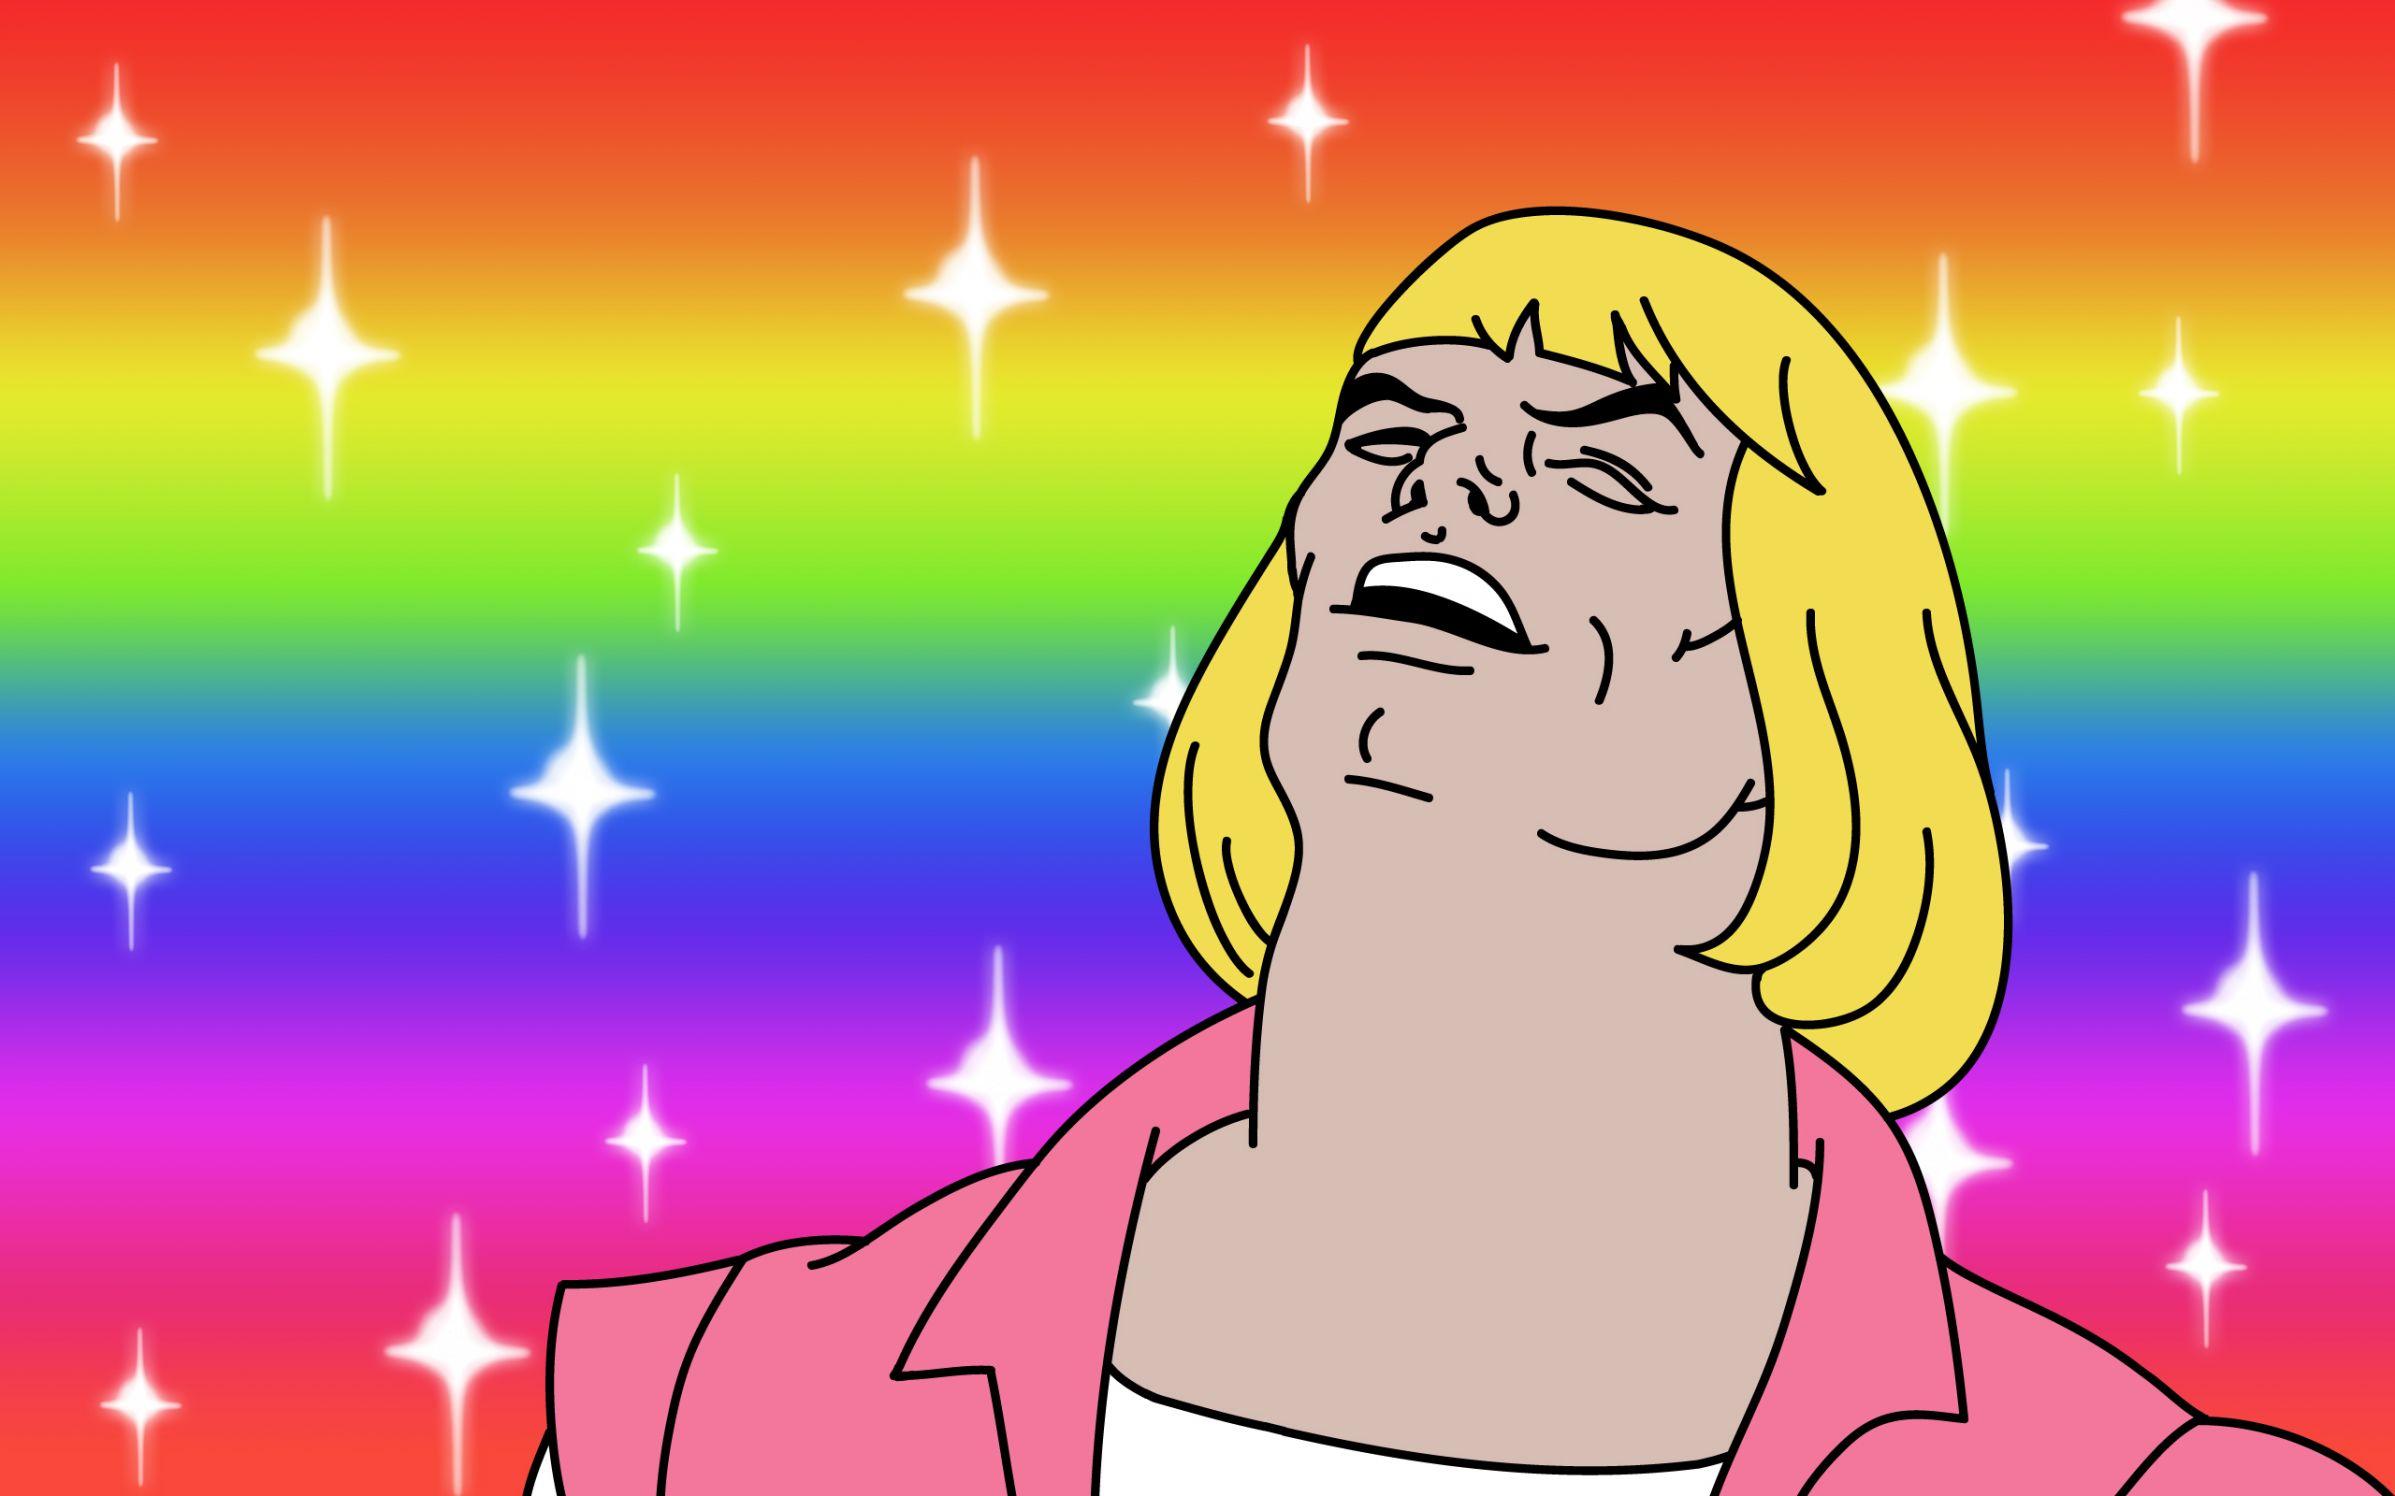 He-Man Blank Template - Imgflip